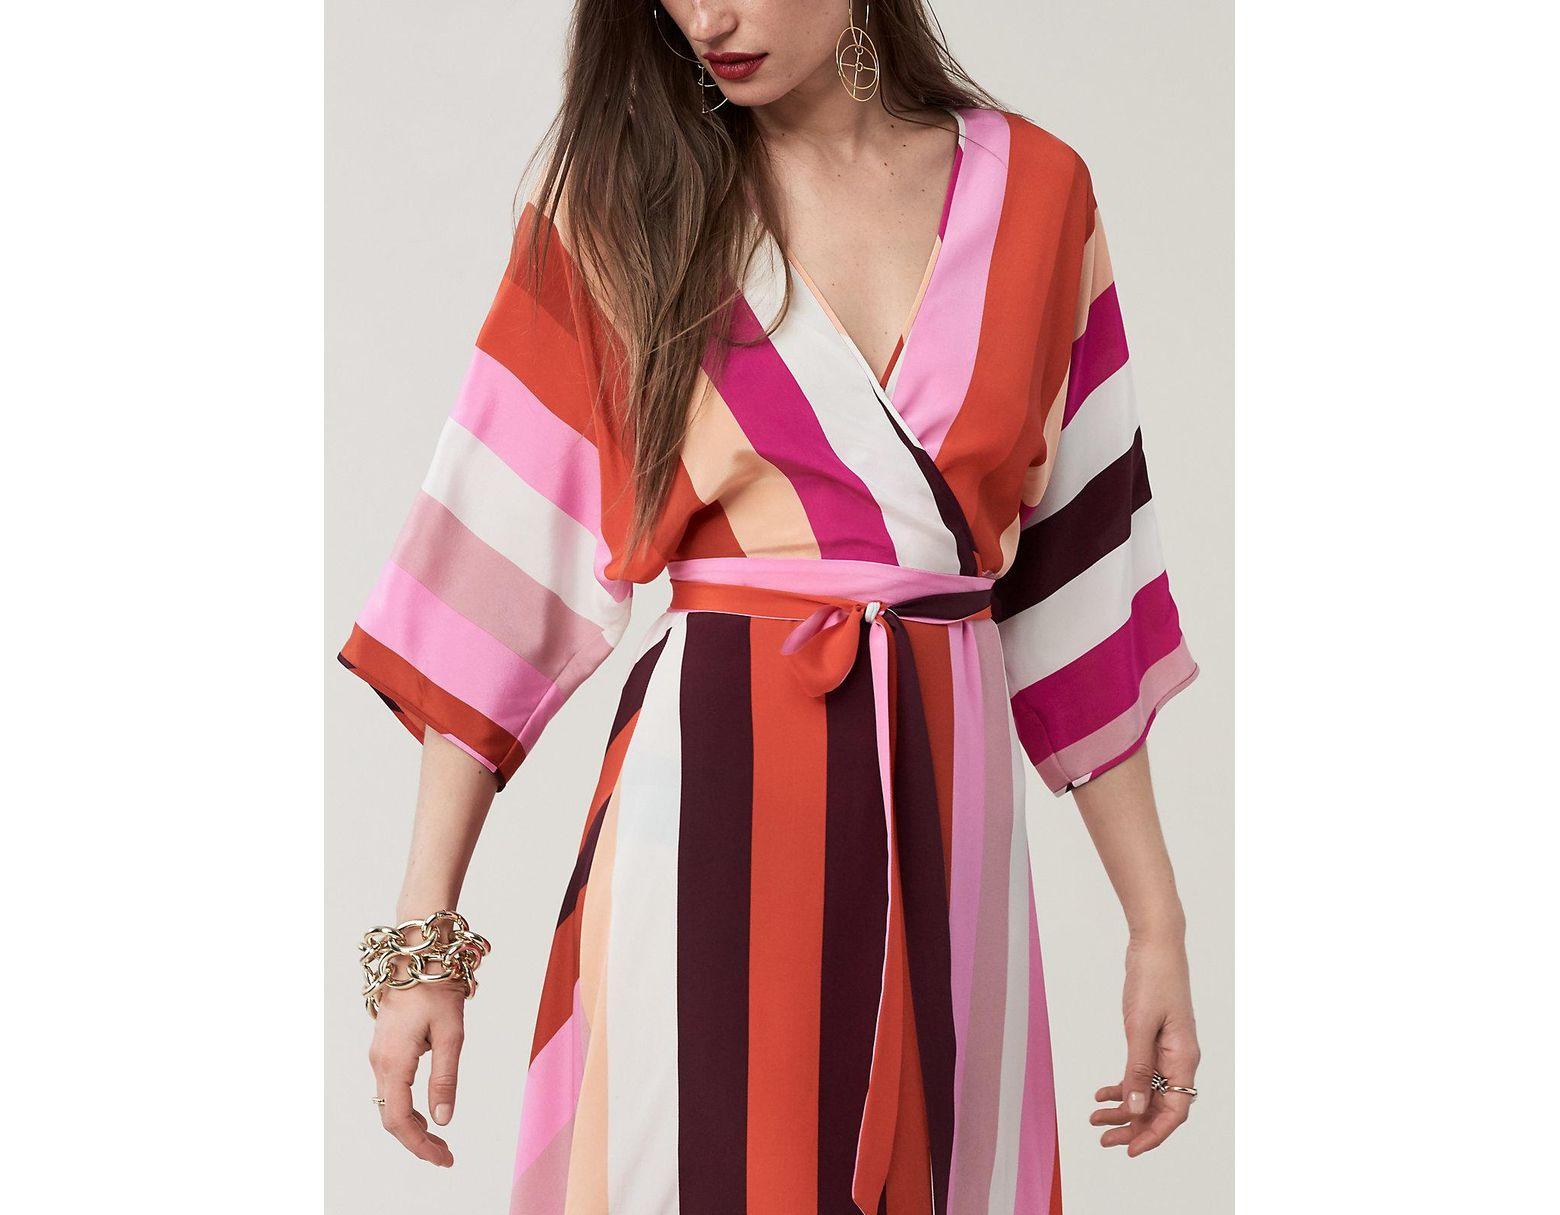 db16c36a8c Diane von Furstenberg Eloise Silk Crepe De Chine Maxi Faux-wrap Dress in  Red - Lyst